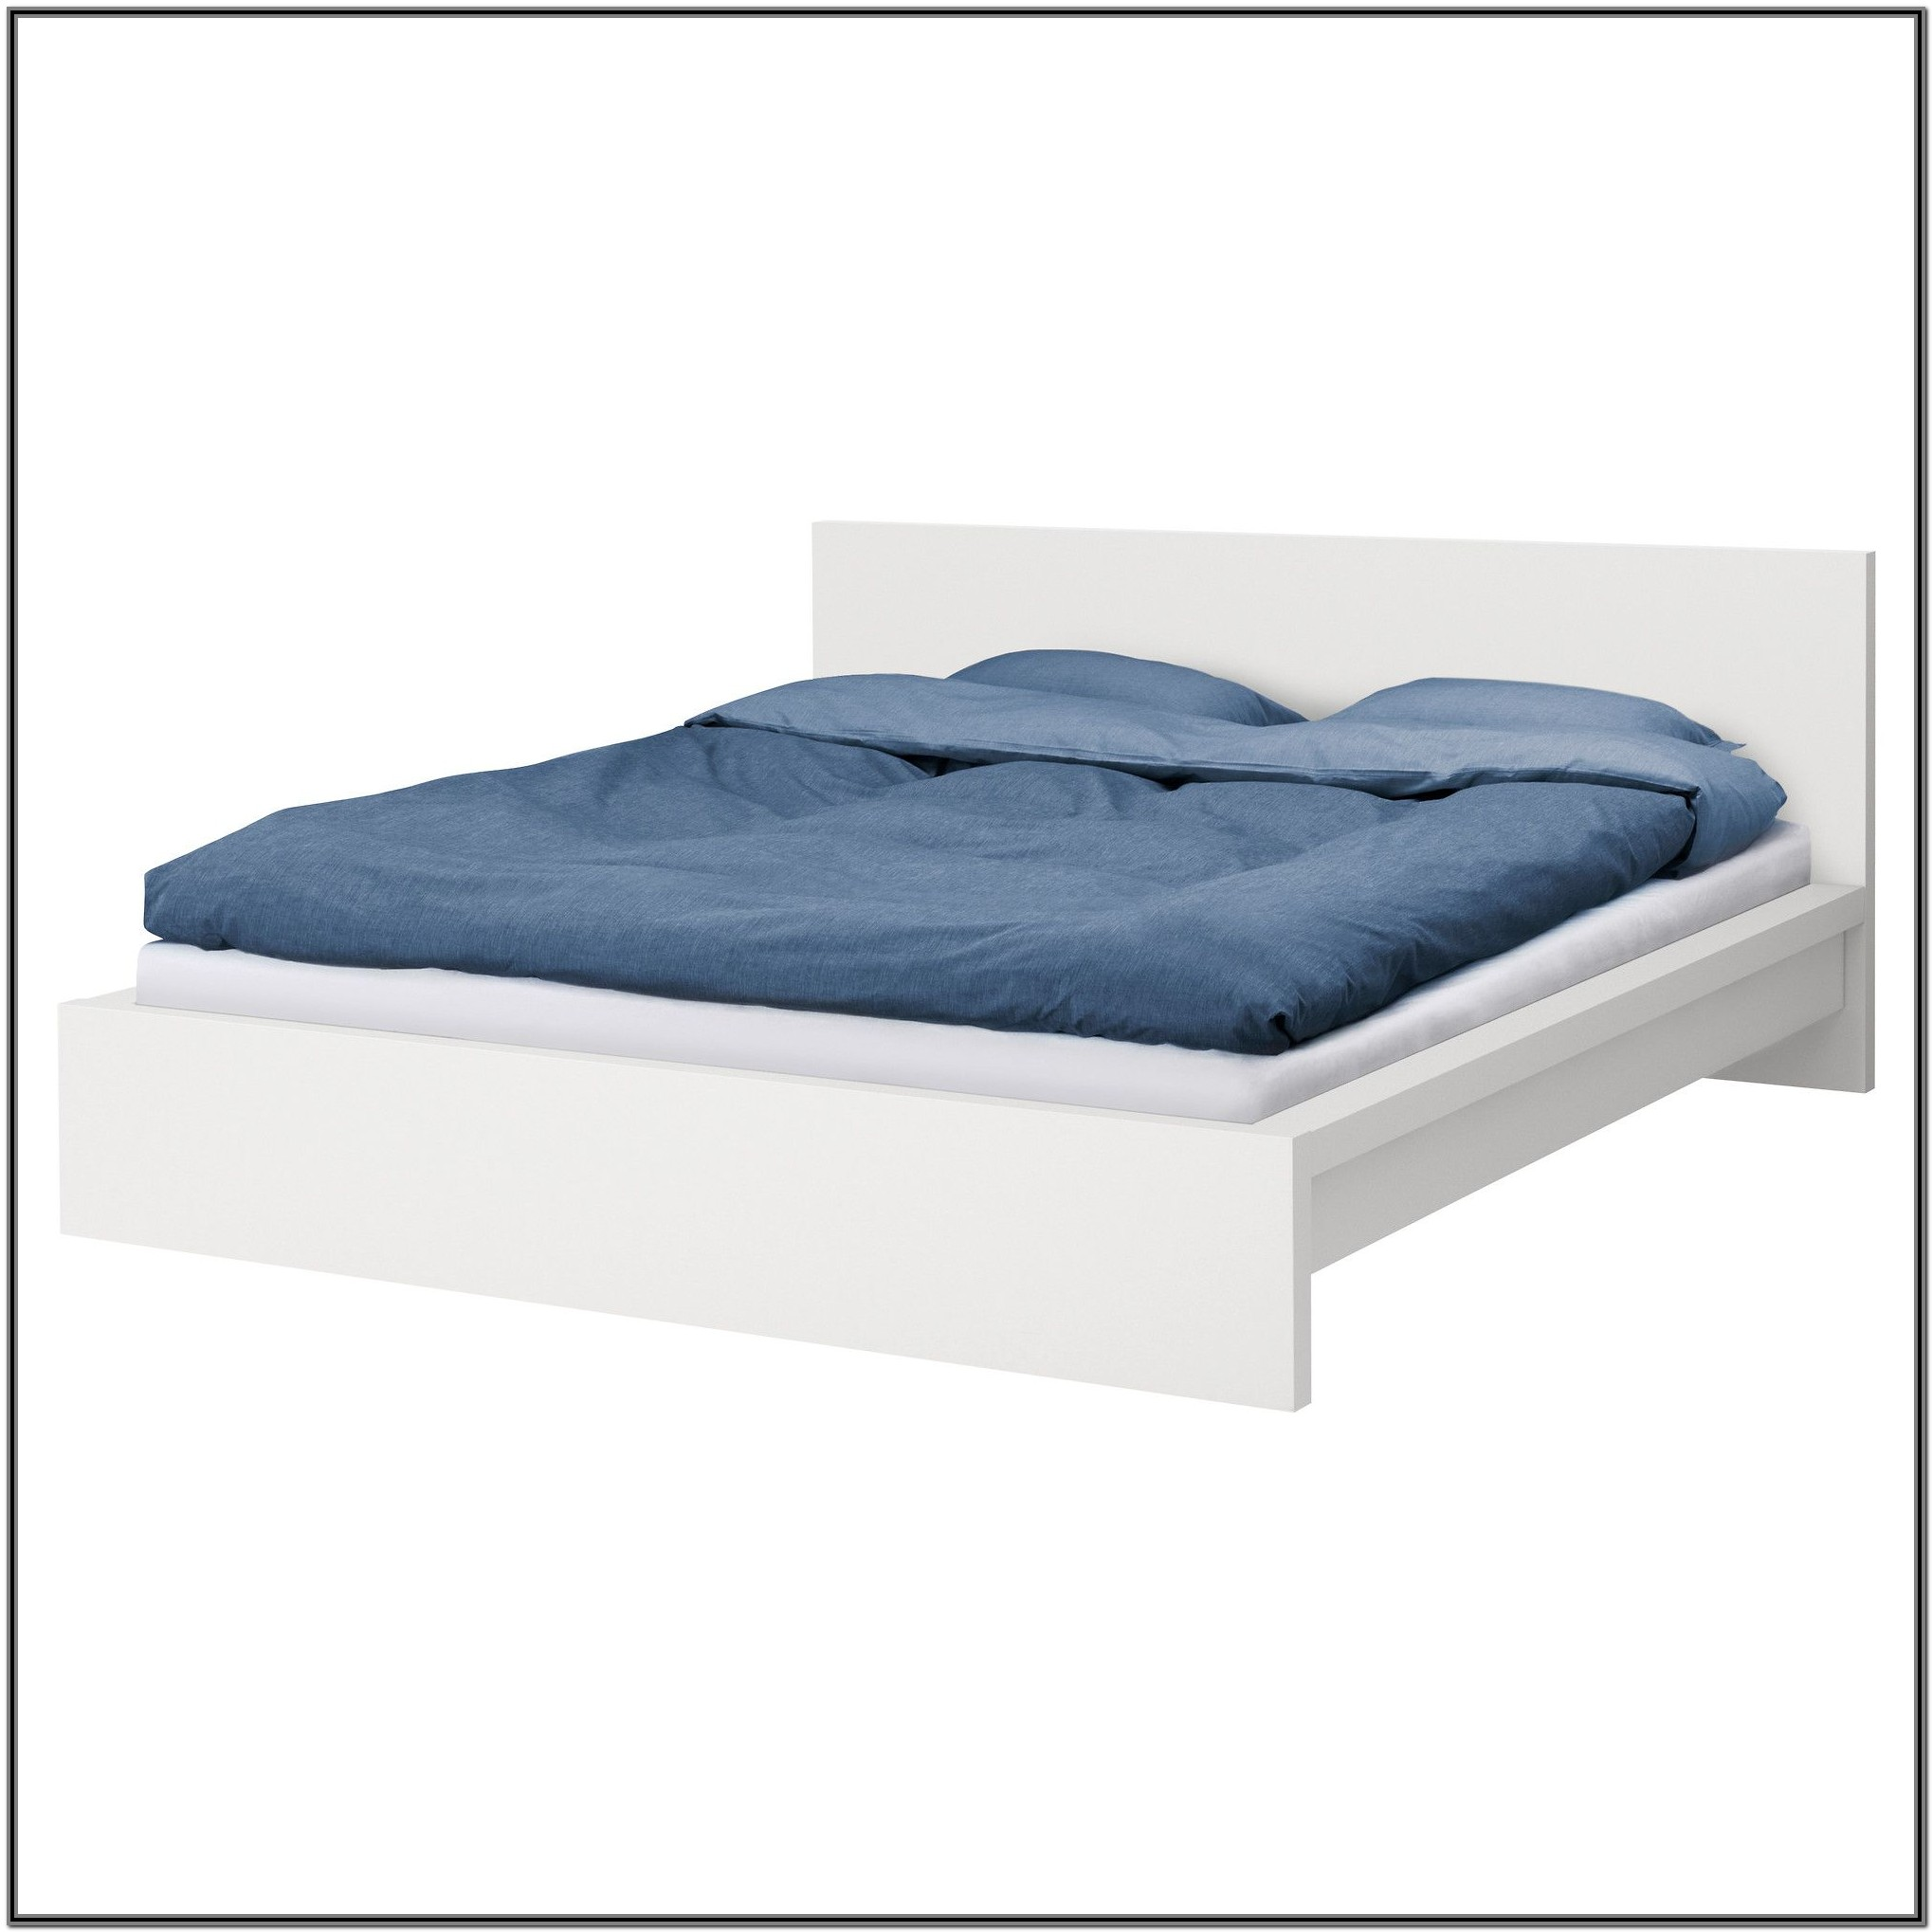 Ikea Malm Bed Frame White Full